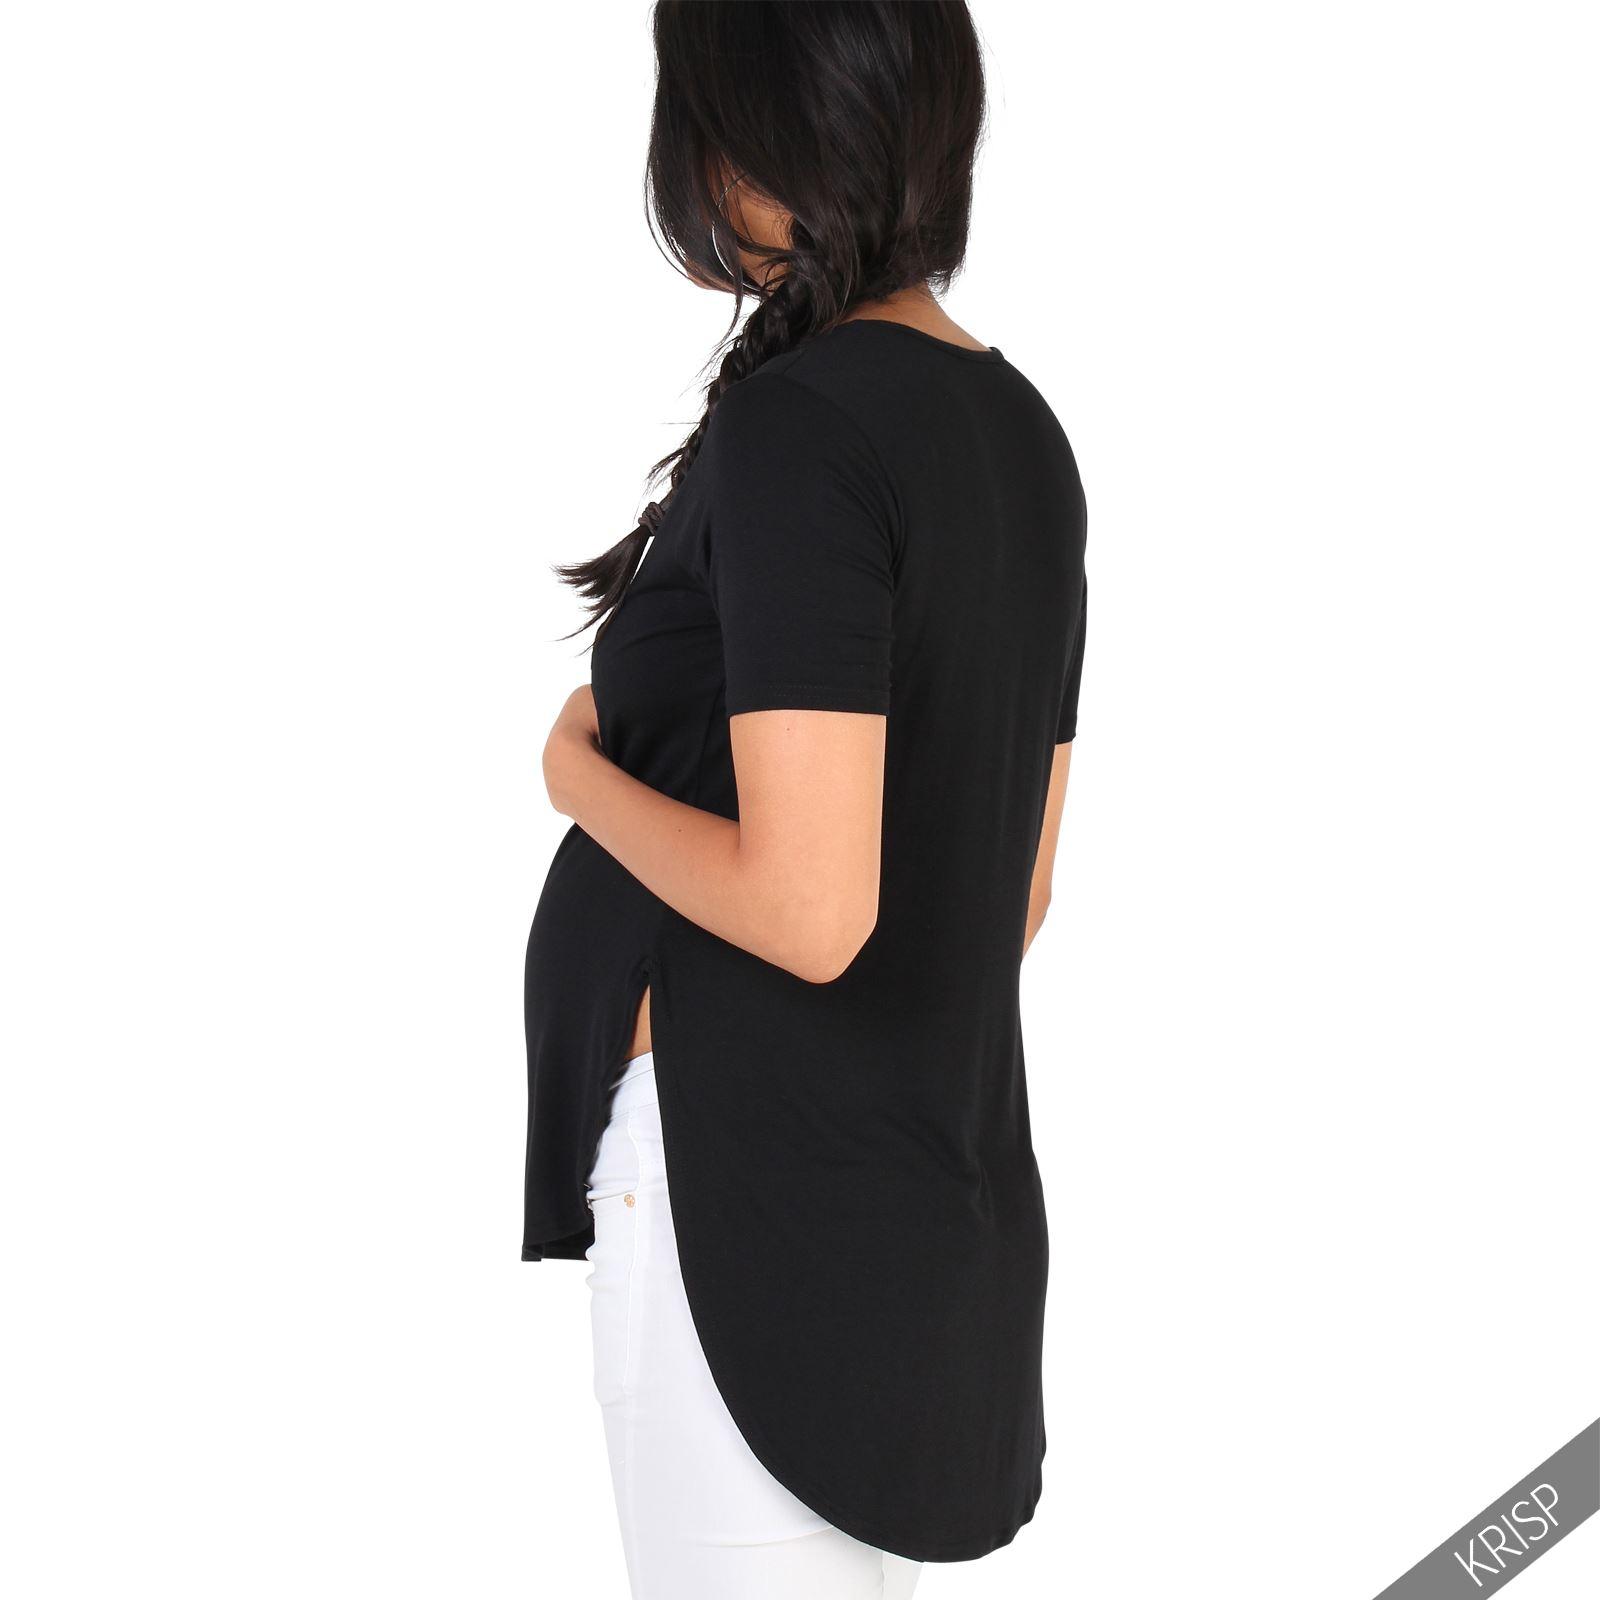 bc6914413b3 Camiseta Premamá Top Ancho Asimétrico Ropa Embarazada Moderna Oferta ...